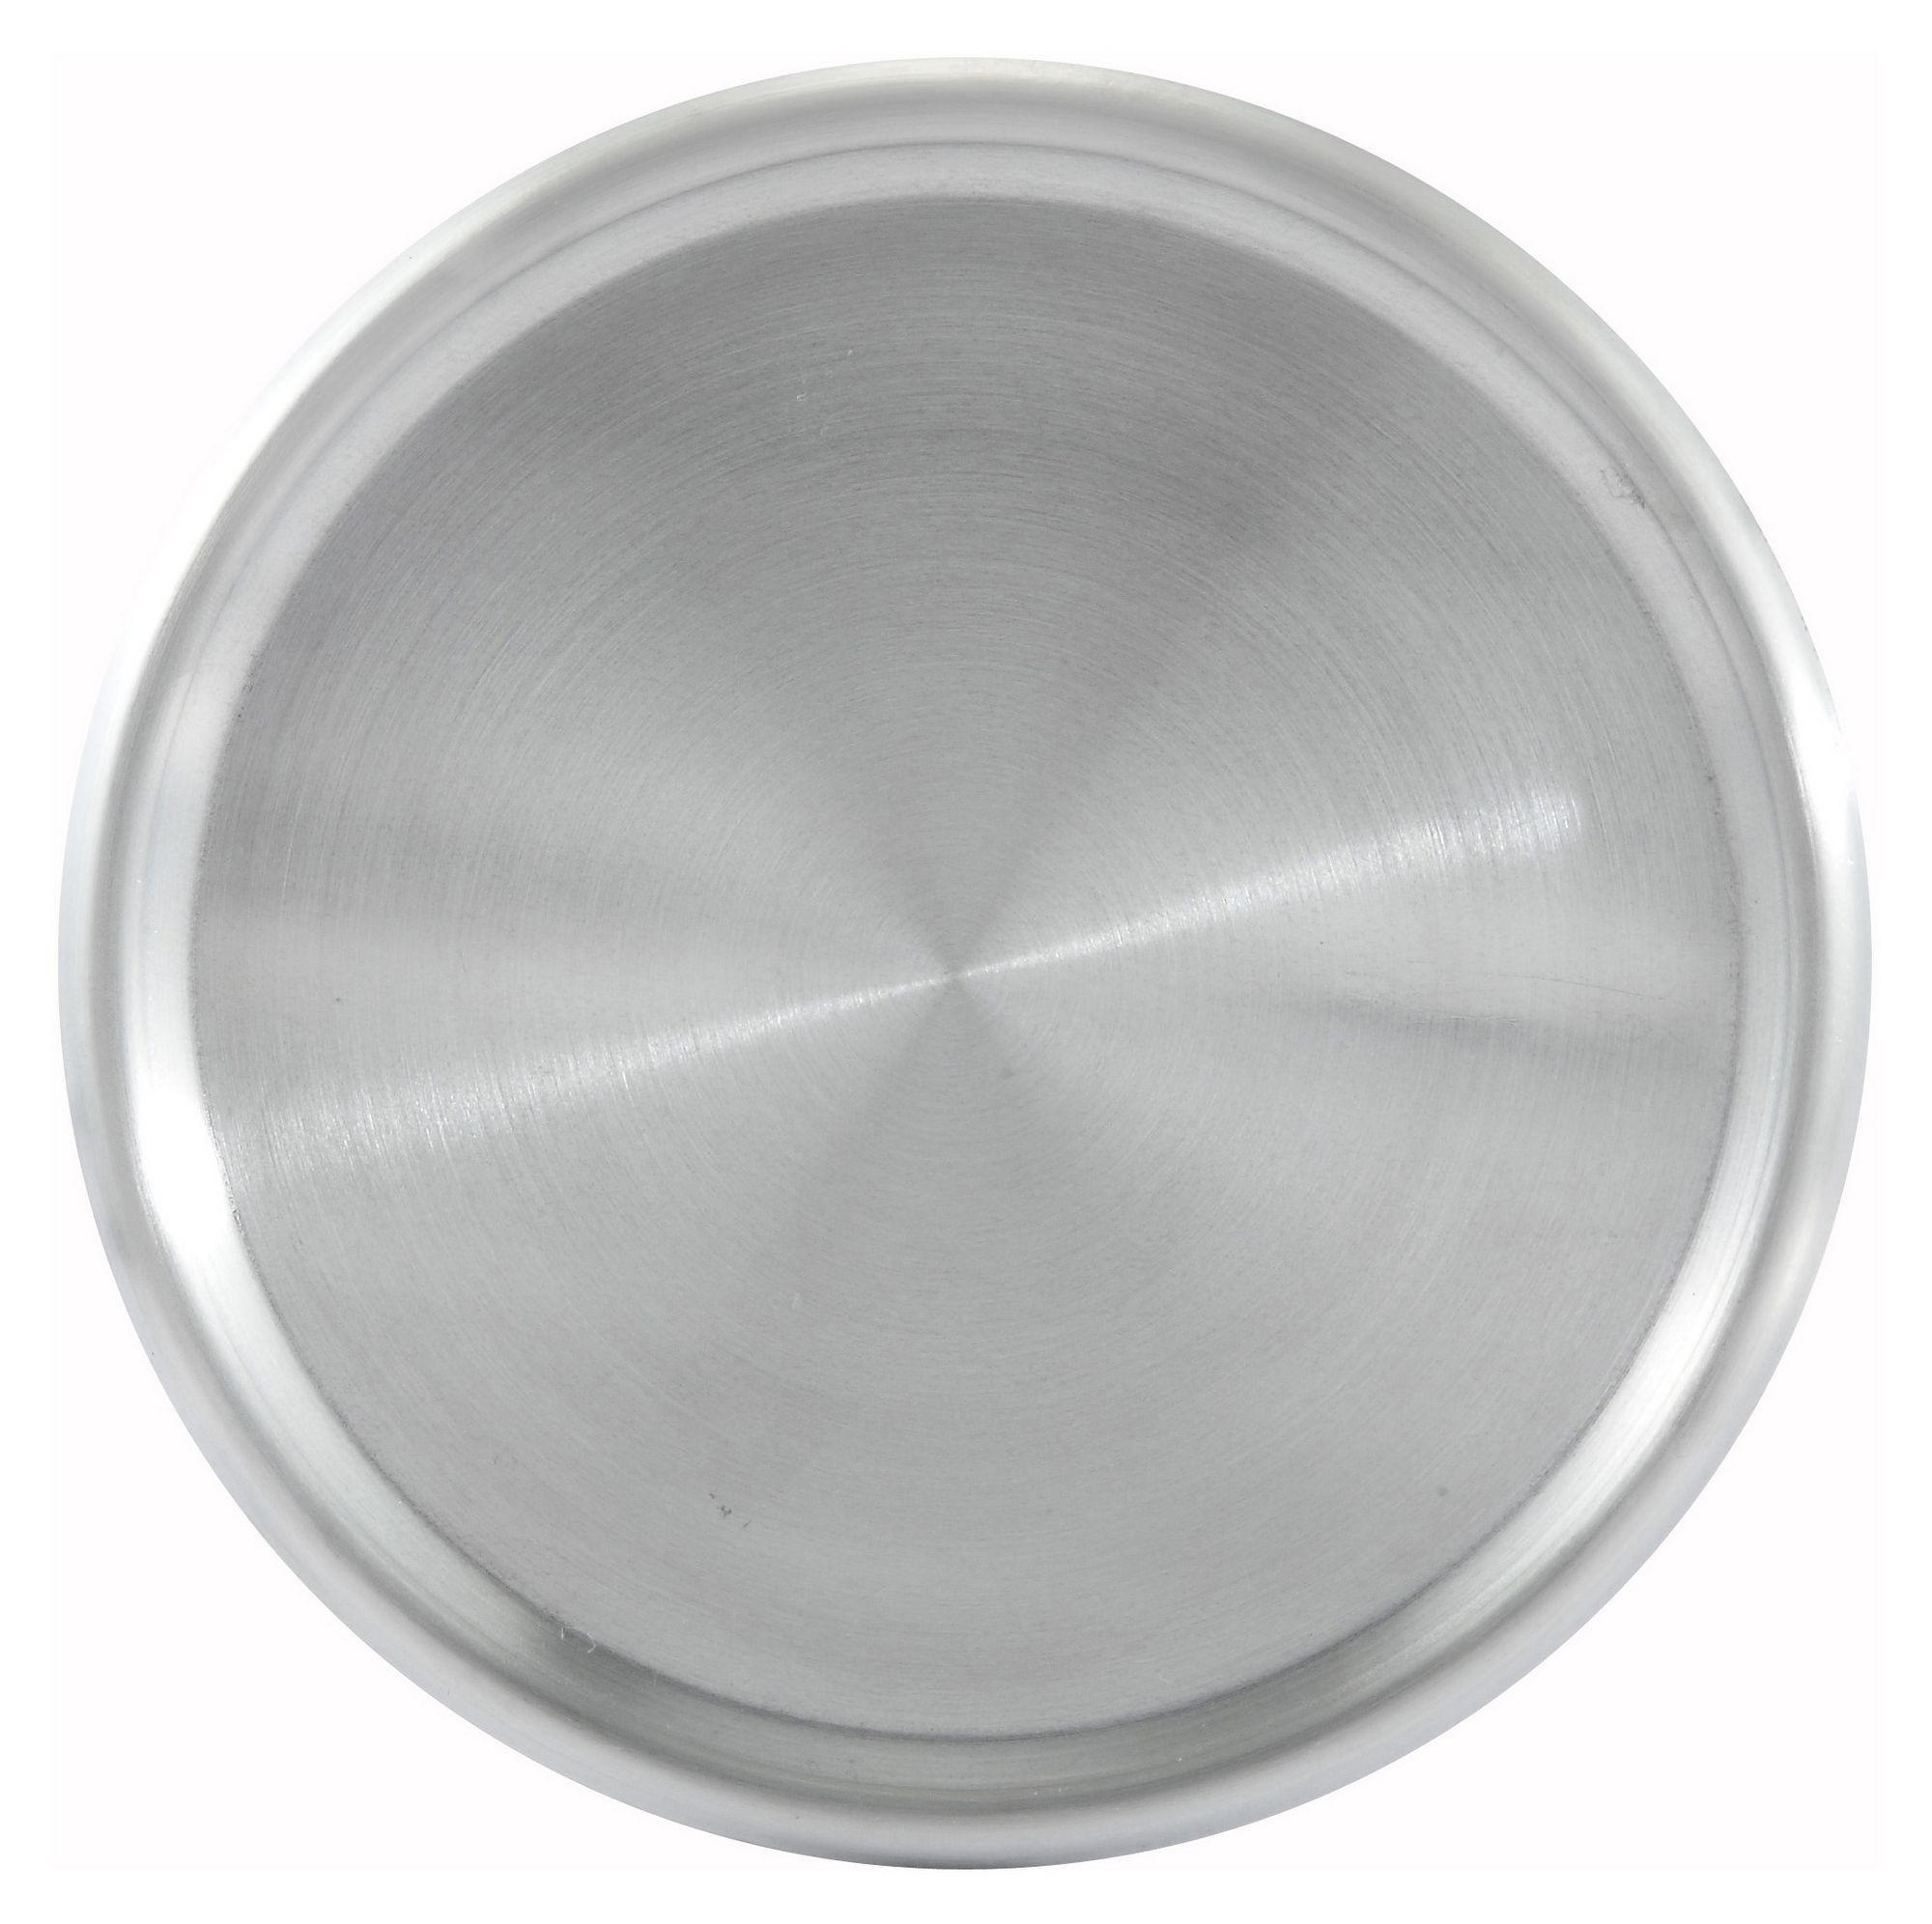 Winco ALDP-48C Cover for 48 oz. Dough Retarding/Proofing Pan